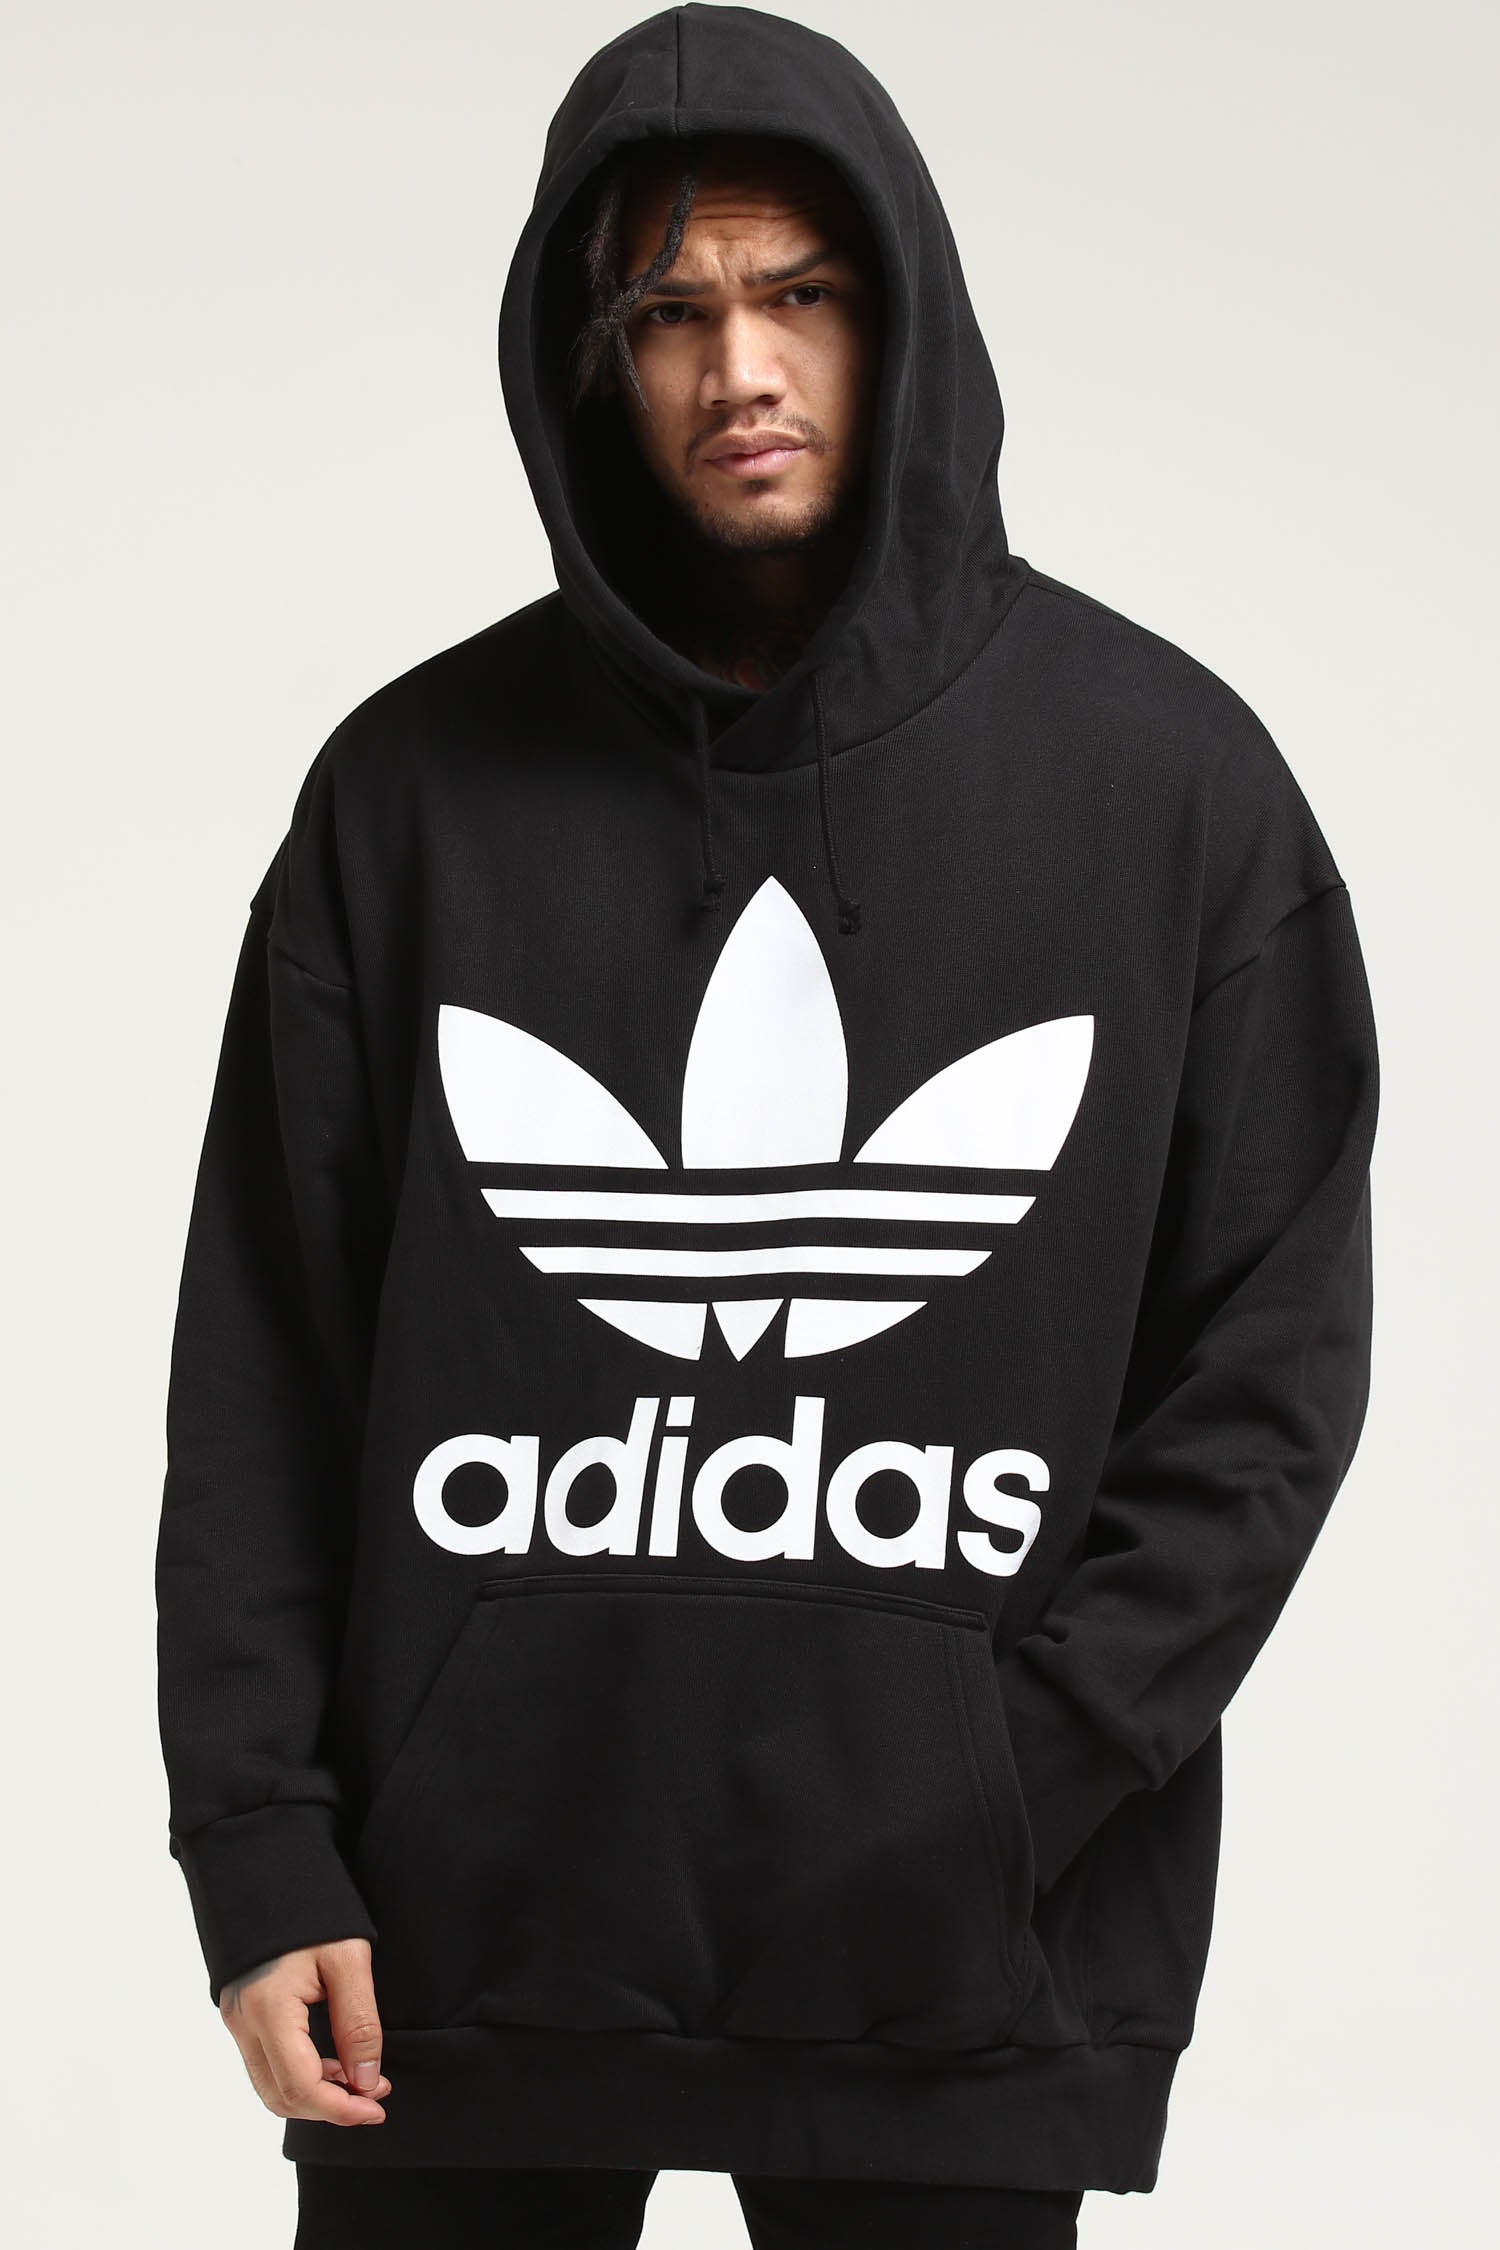 adidas Trefoil Oversize Sweatshirt